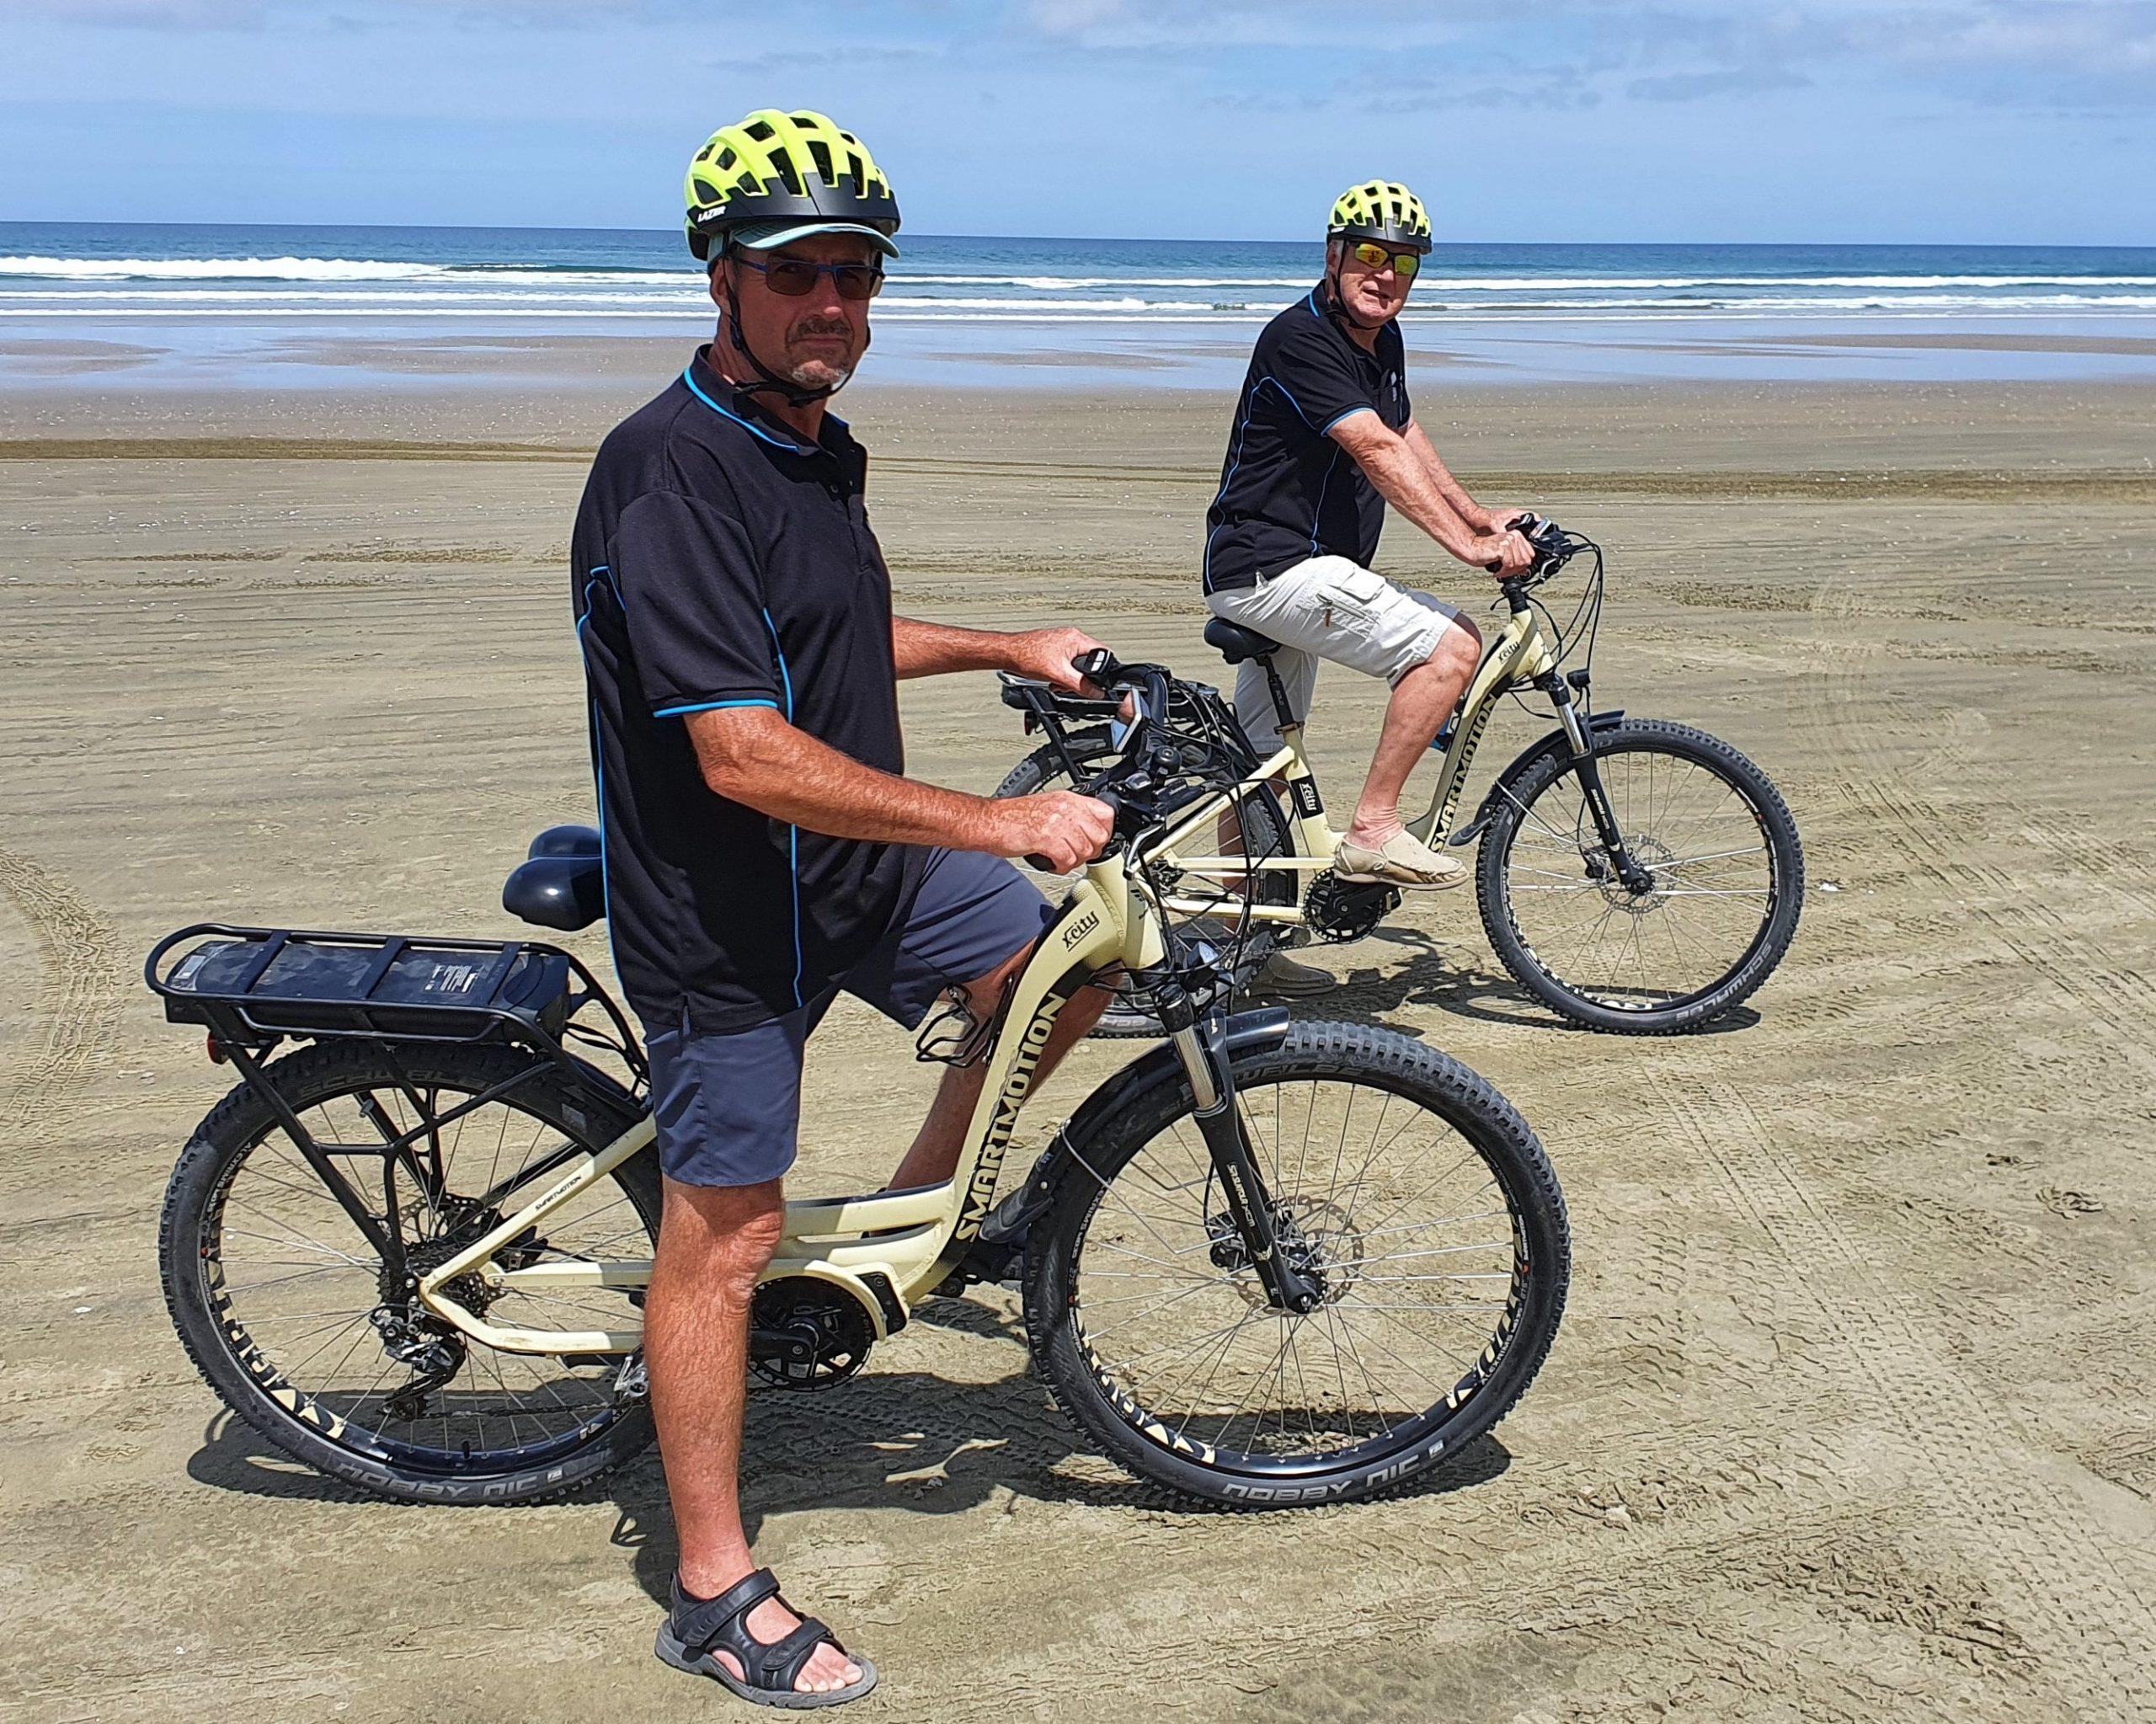 Ebikes on 90 mile beach